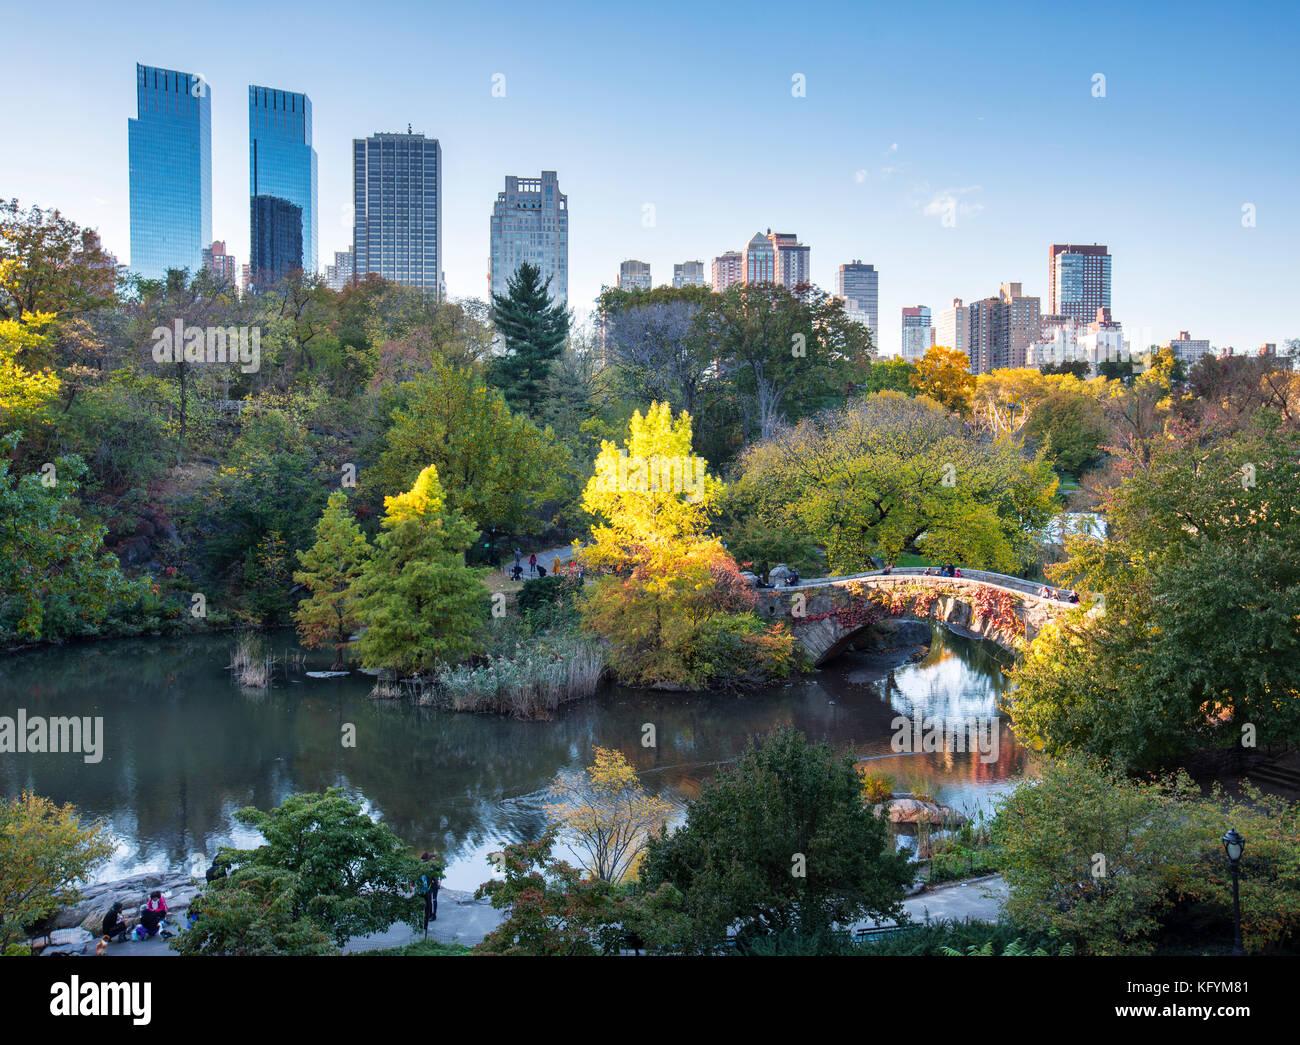 Autumn in Central Park, Gapstow Bridge, New York City - Stock Image